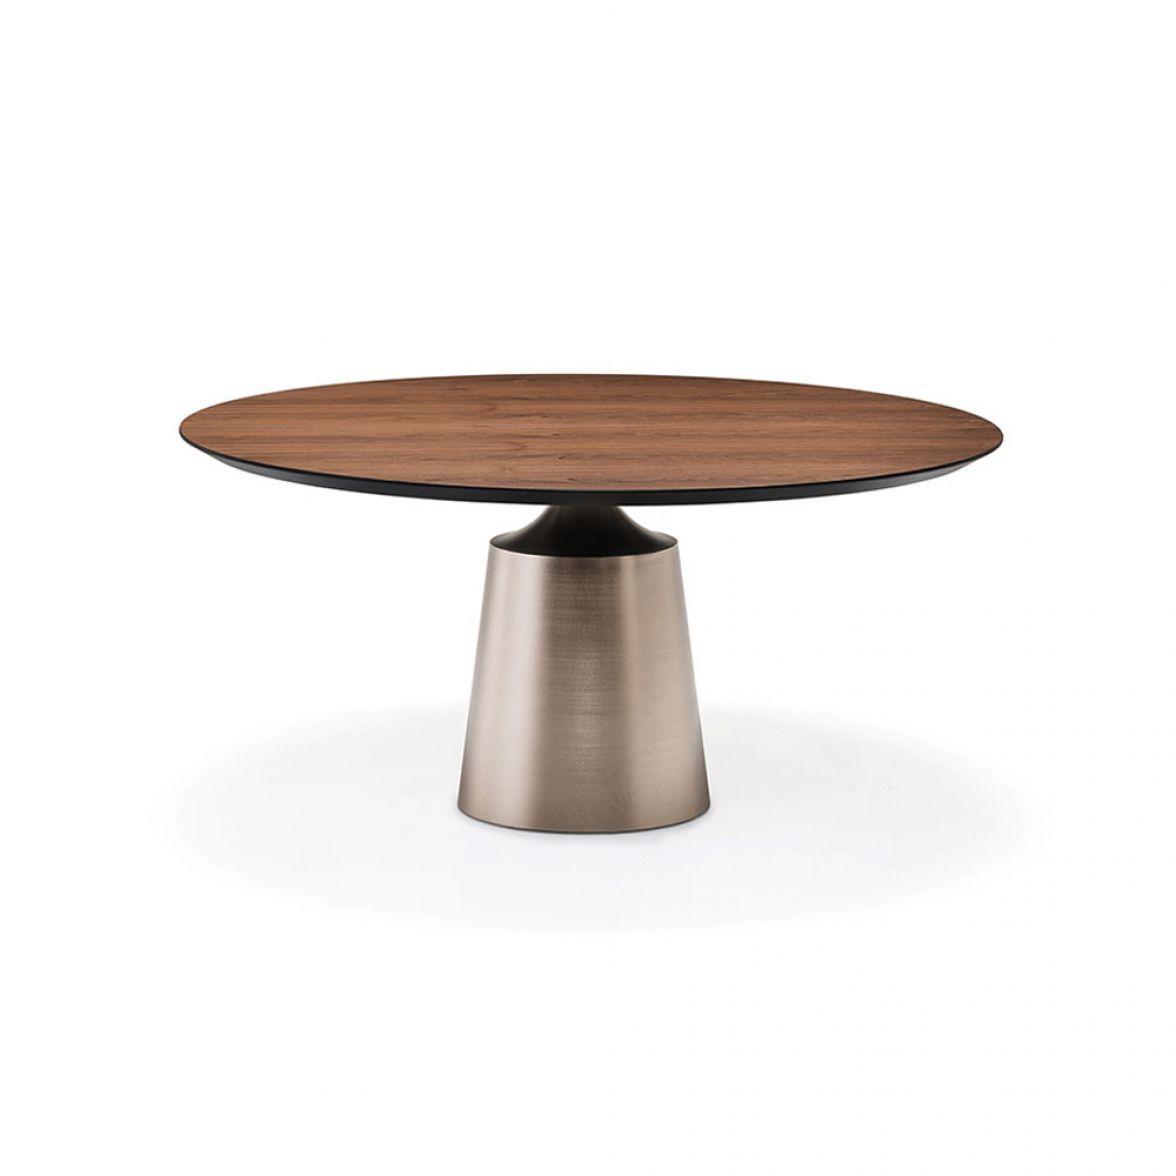 Yoda wood table фото цена